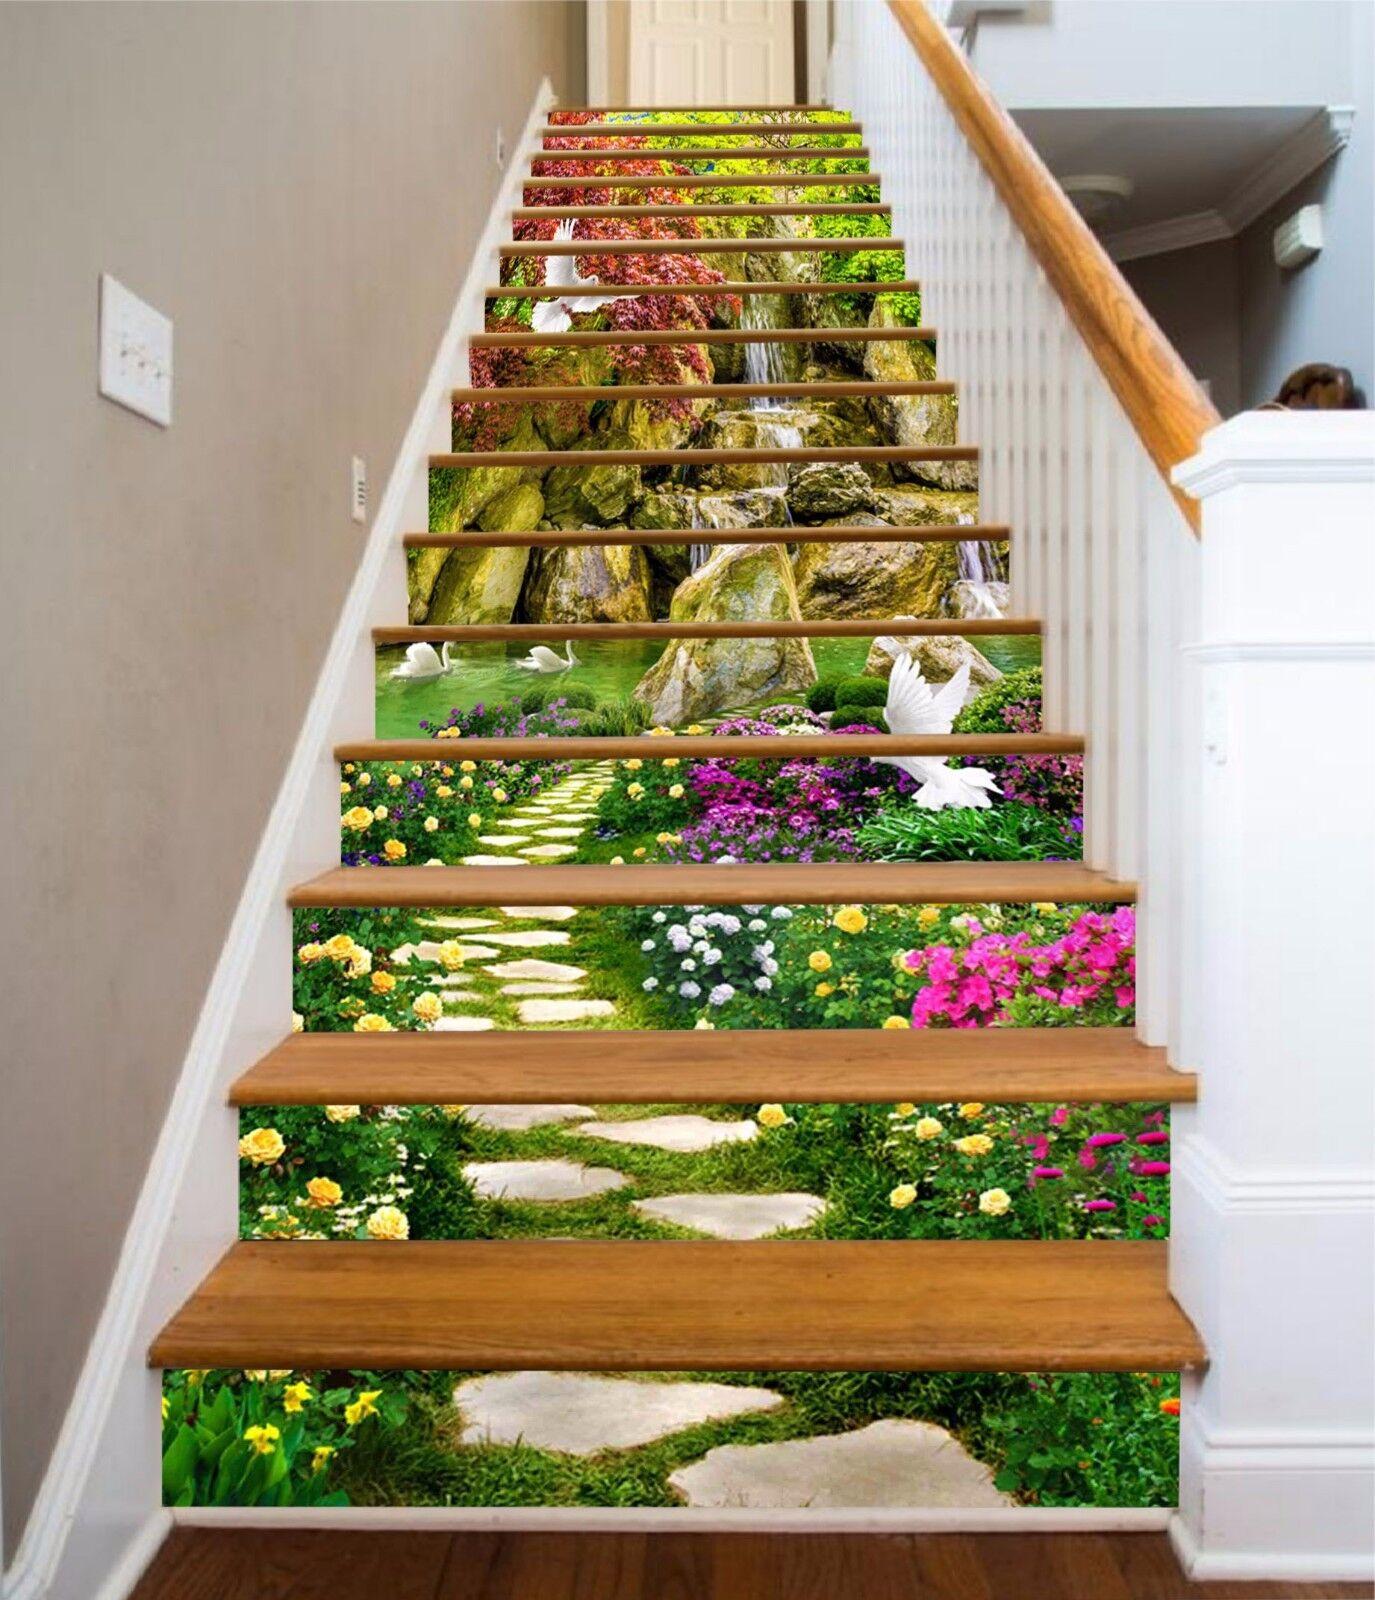 3D Nature Garden 89 Stair Risers Decoration Photo Mural Vinyl Decal Wallpaper AU